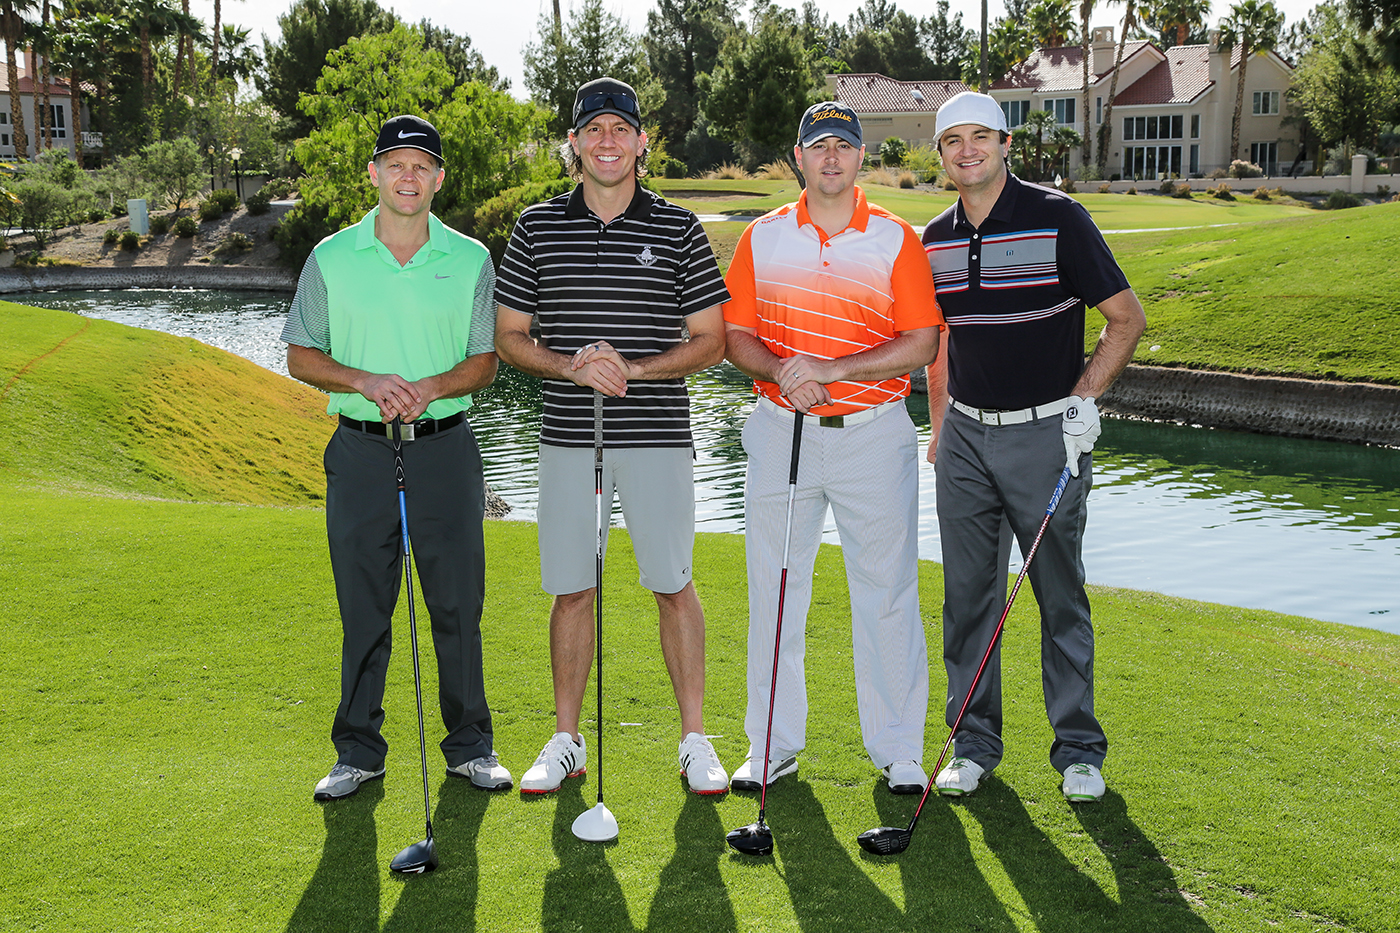 Image Las Vegas Golf Photography